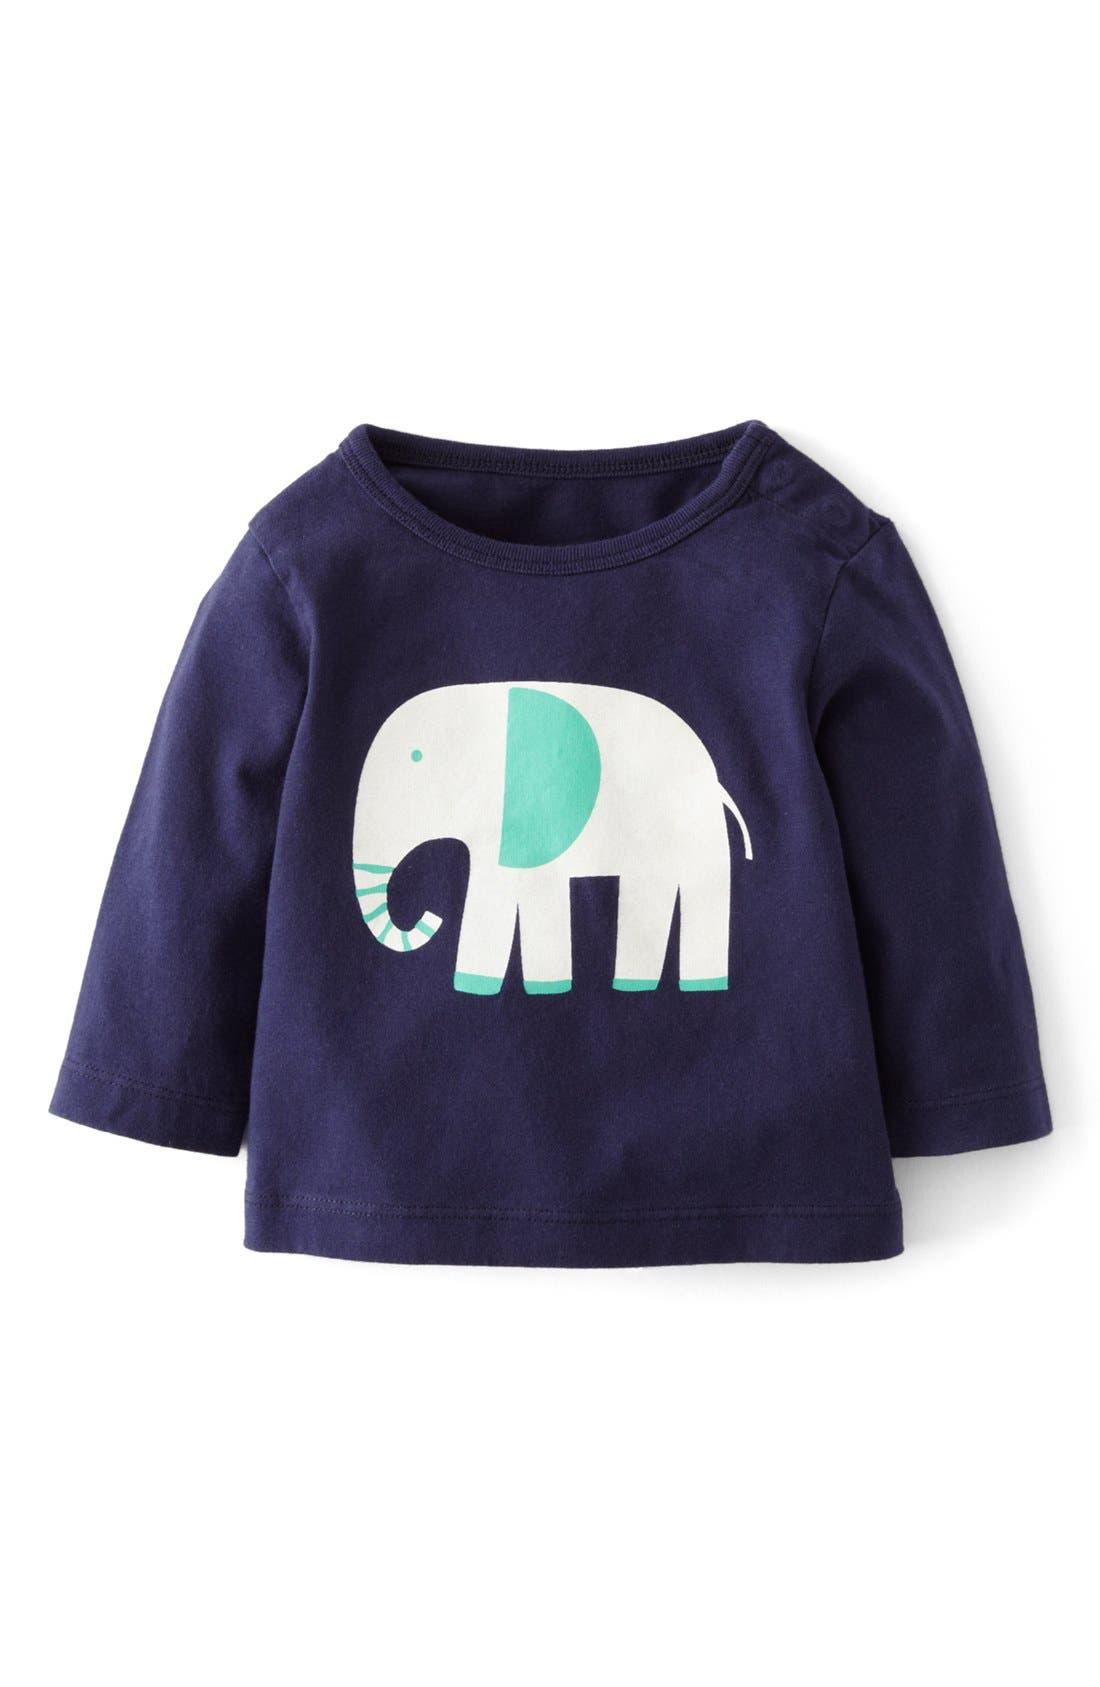 Alternate Image 1 Selected - Mini Boden 'Fun' Print Logo T-Shirt (Baby Boys)